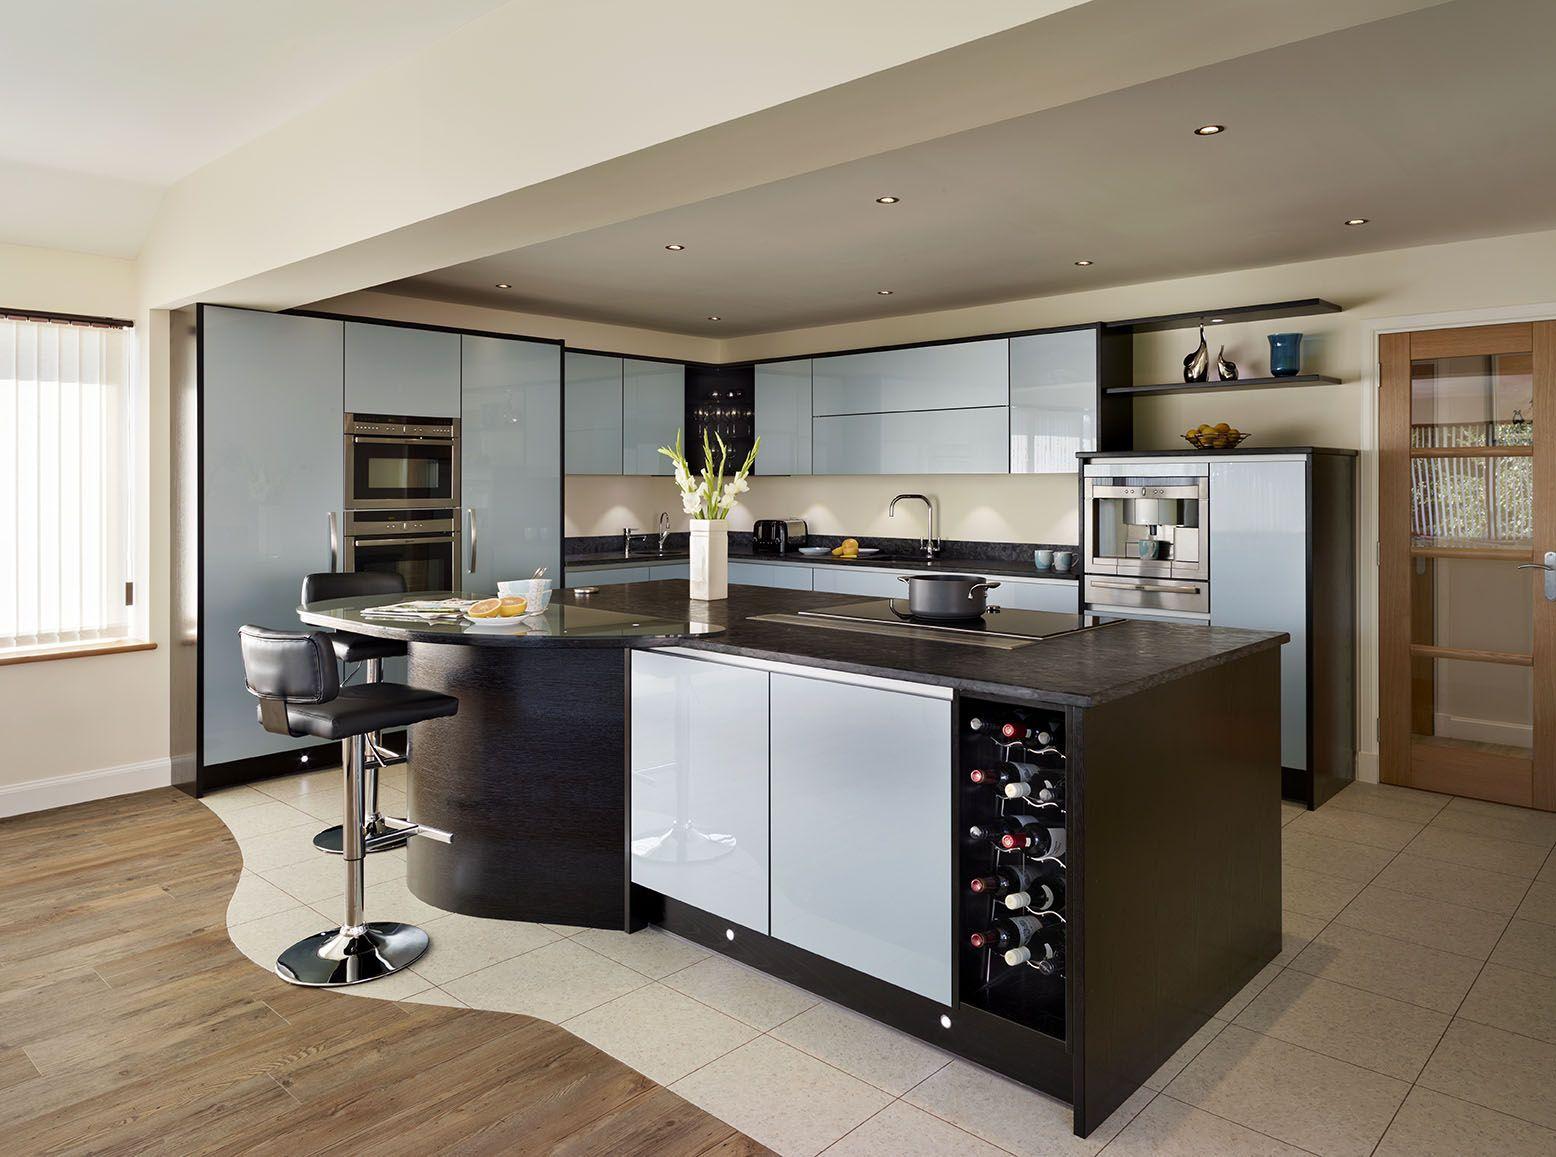 Inside Mansions Kitchen | Imagearea.info | Pinterest | Mansion ...